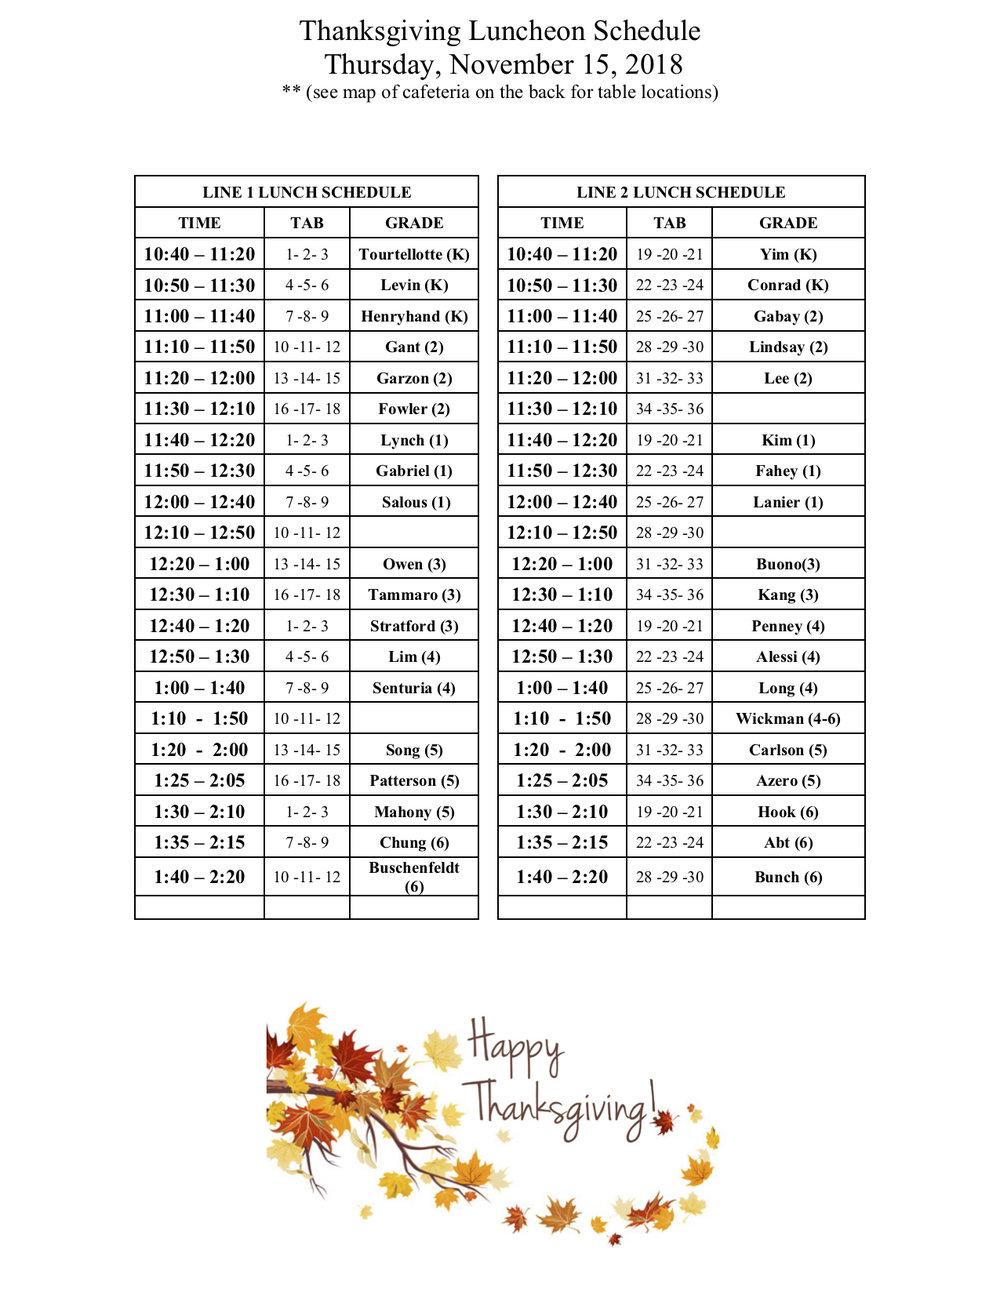 Thanksgiving lunch schedule 2018 FINAL.jpg